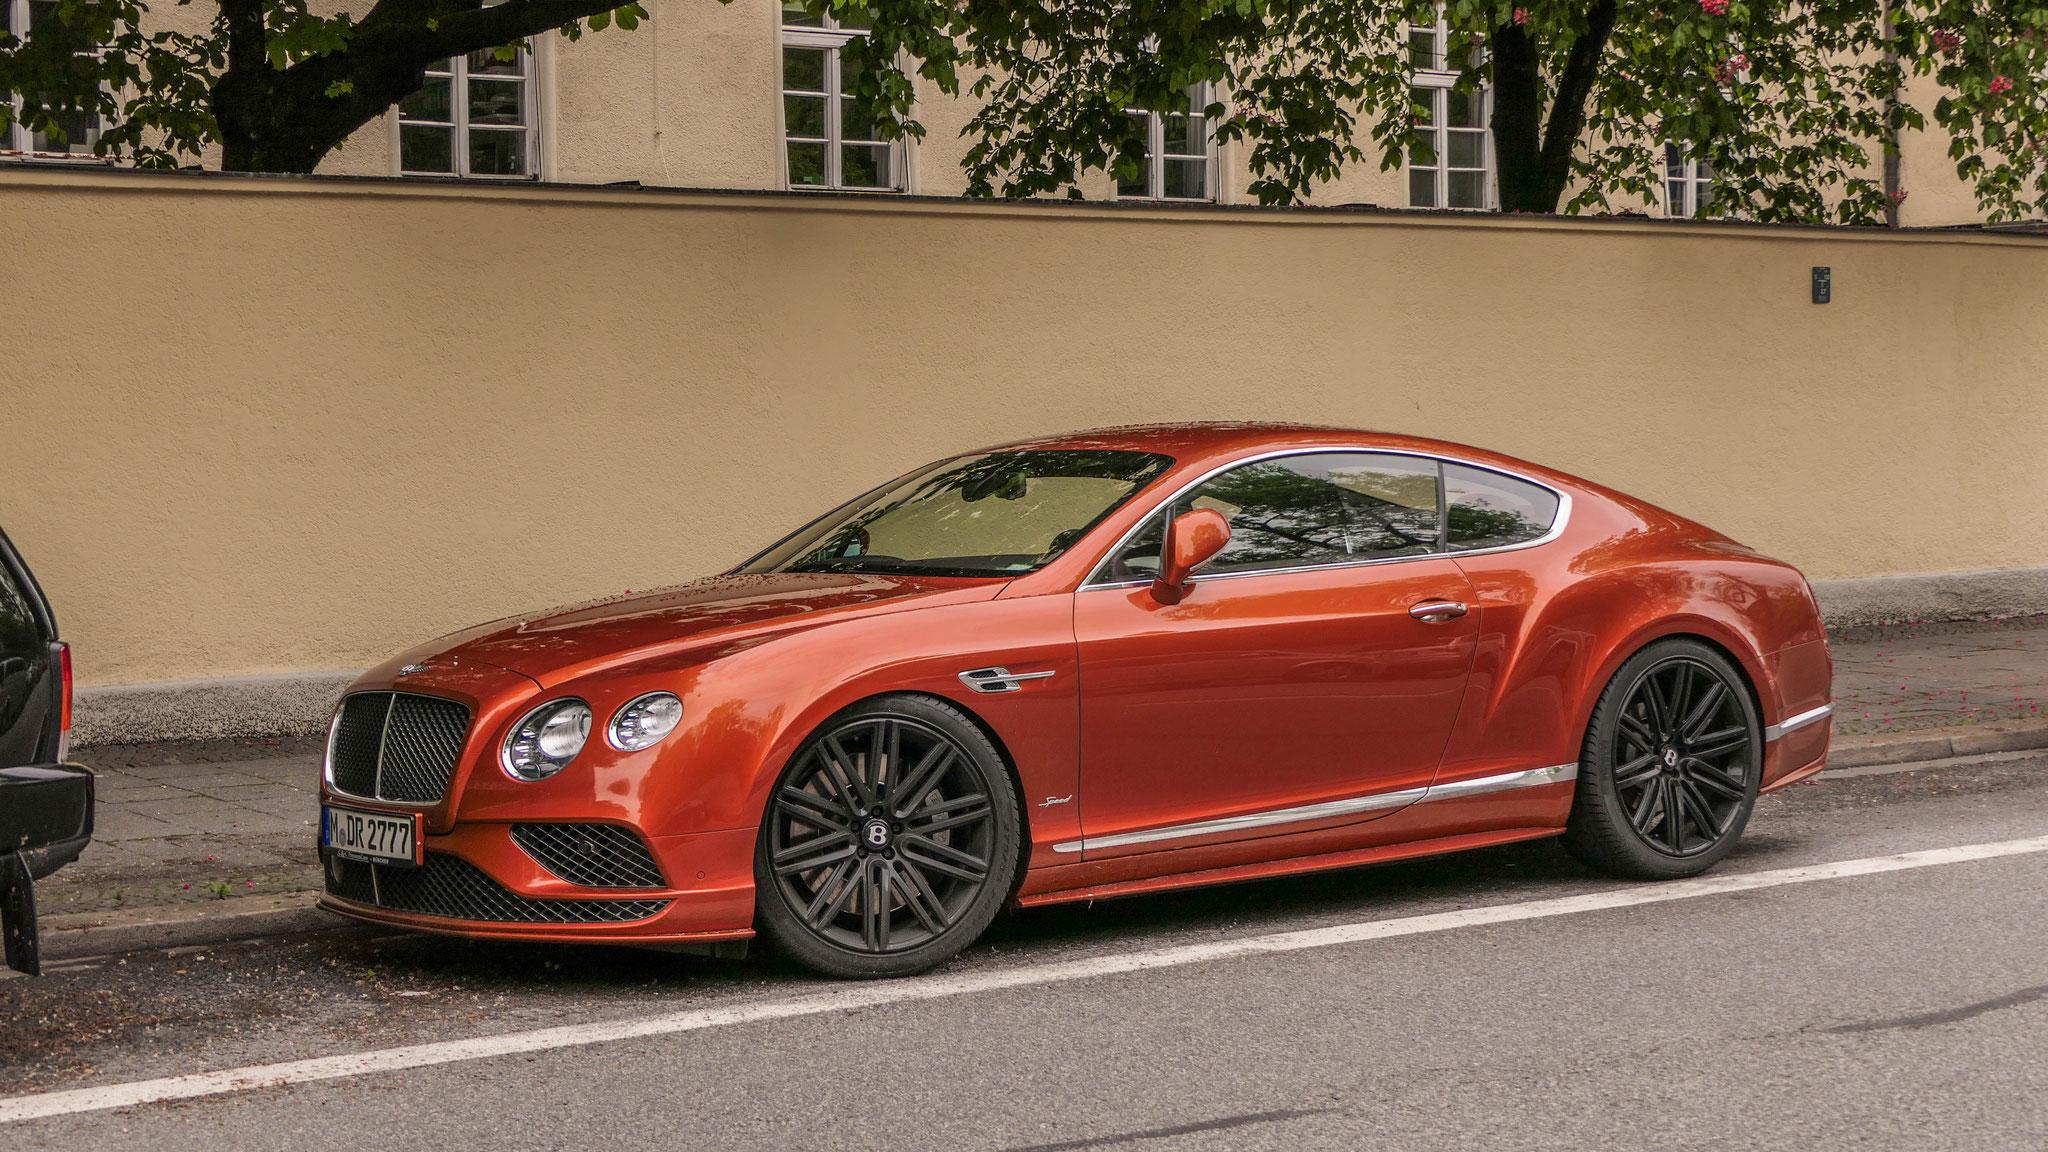 Bentley Continental GT Speed - M-DR-2777